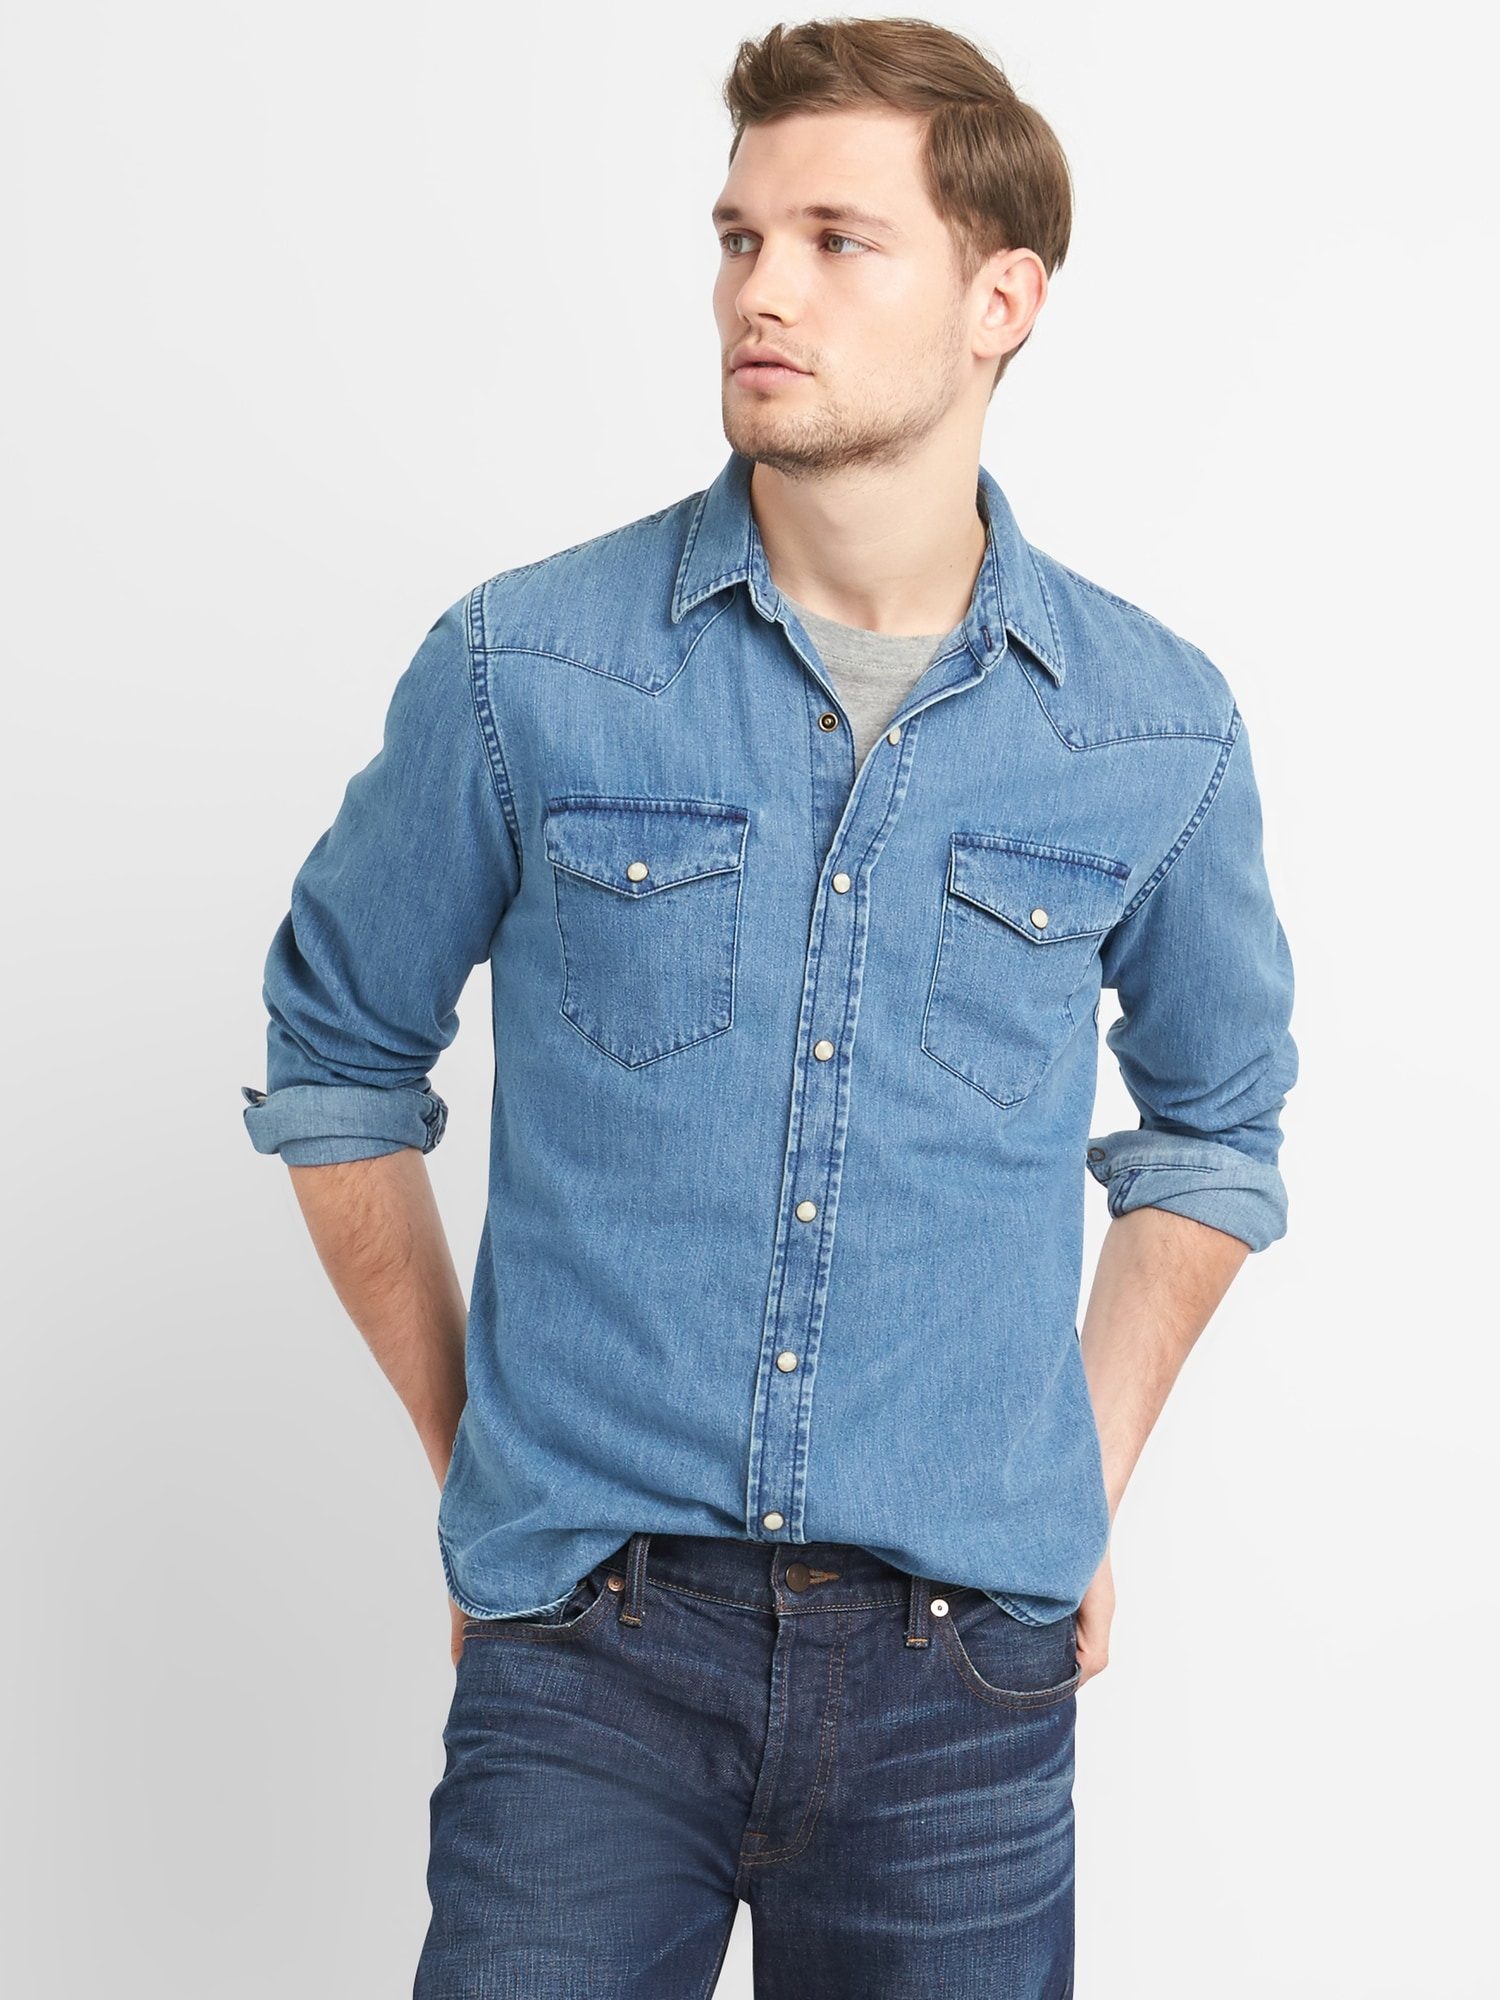 Gap 盖璞 225678 男士西部风修身牛仔衬衫 中度牛仔蓝 175/88A(XS)